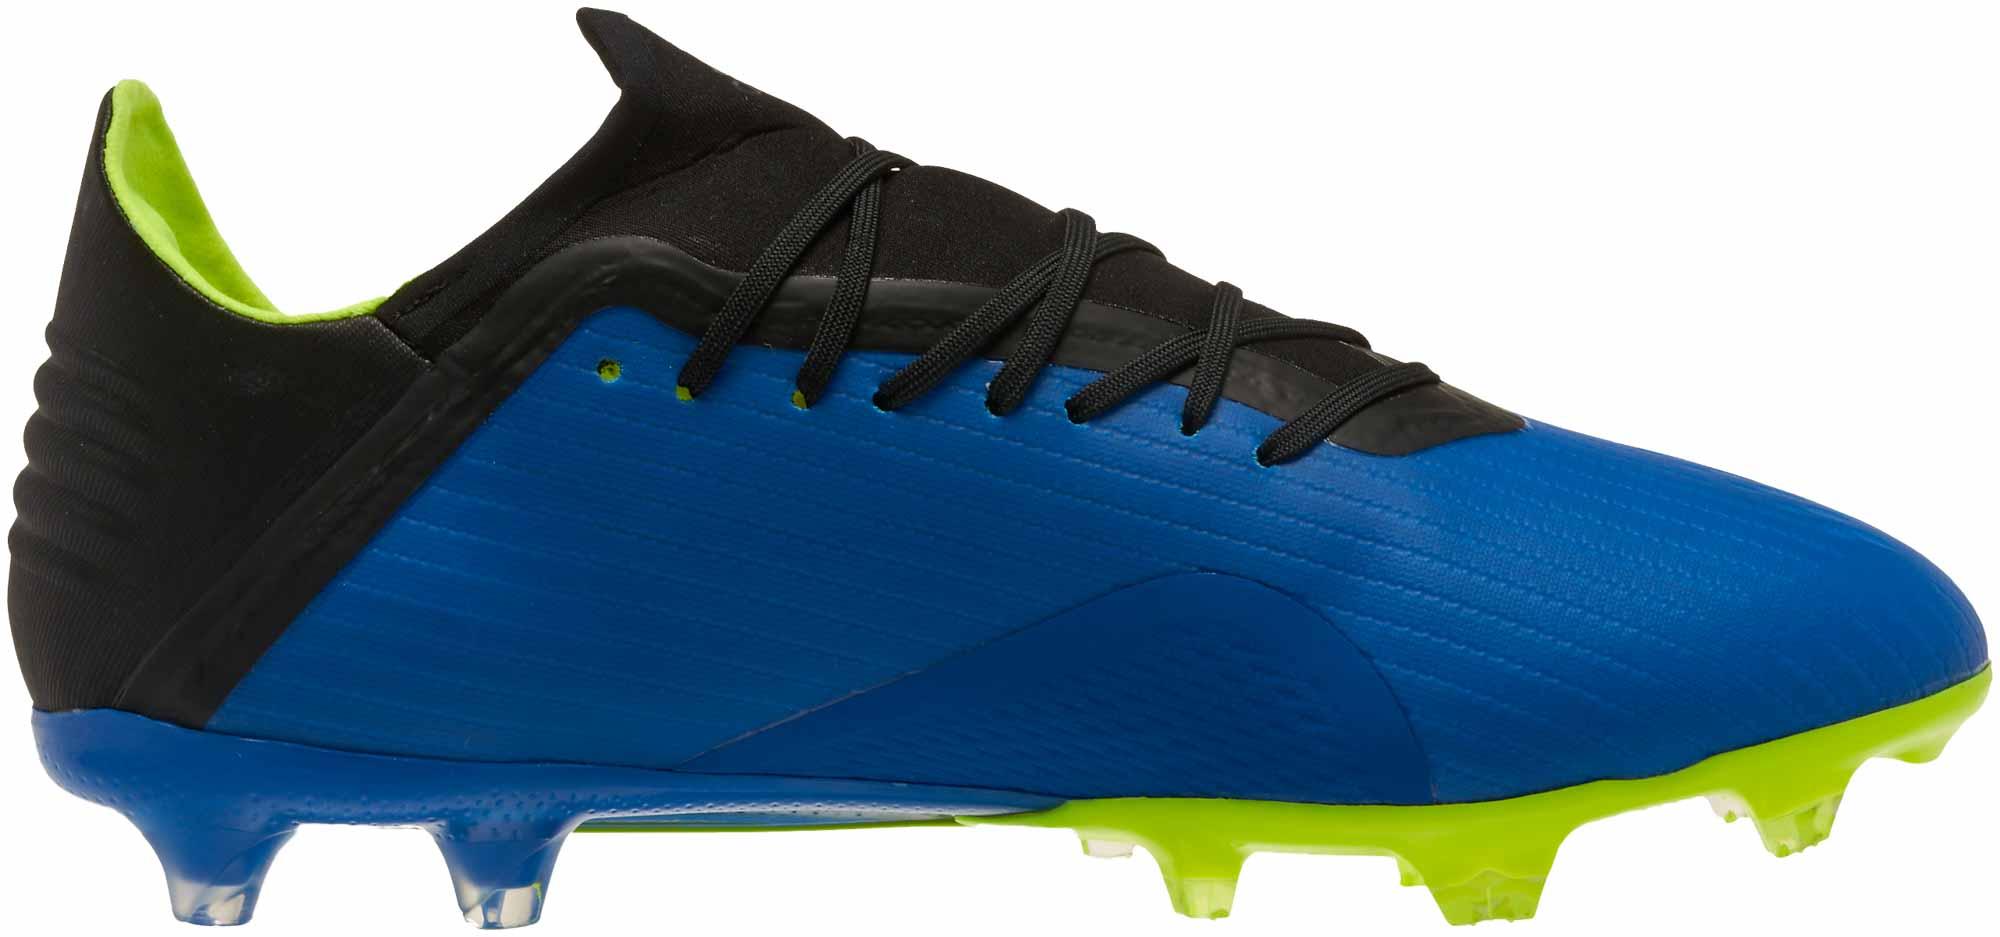 adidas X 18.2 FG Football Blue adidas Soccer Cleats